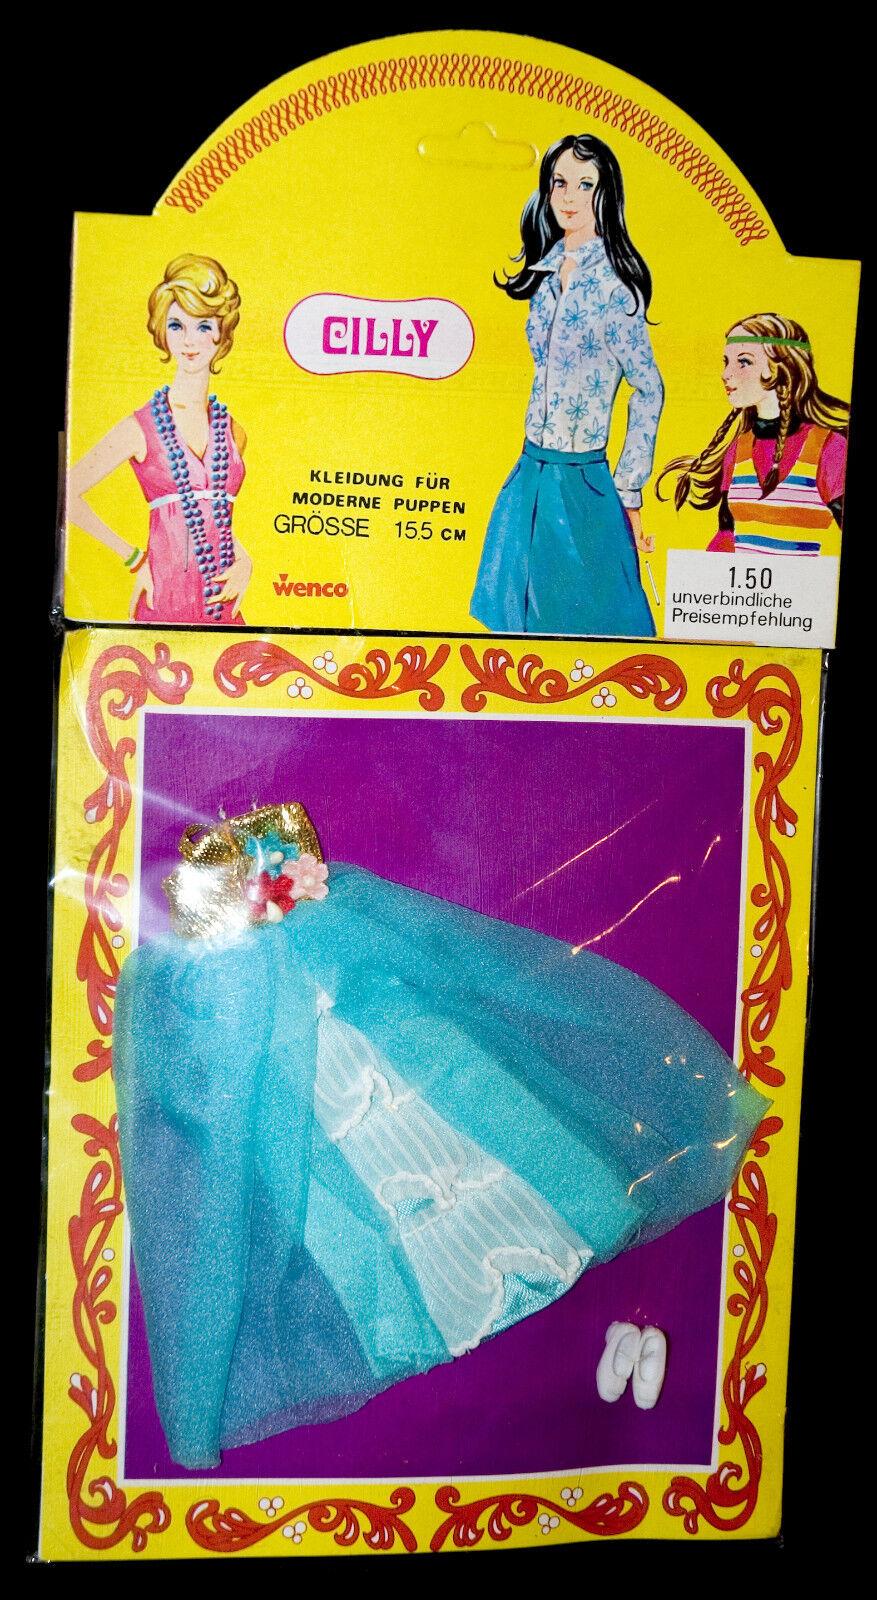 Cilly Vintage 70s Topper Dollhouse Muñeca Rara Simular Traje 15cm Ropa de la